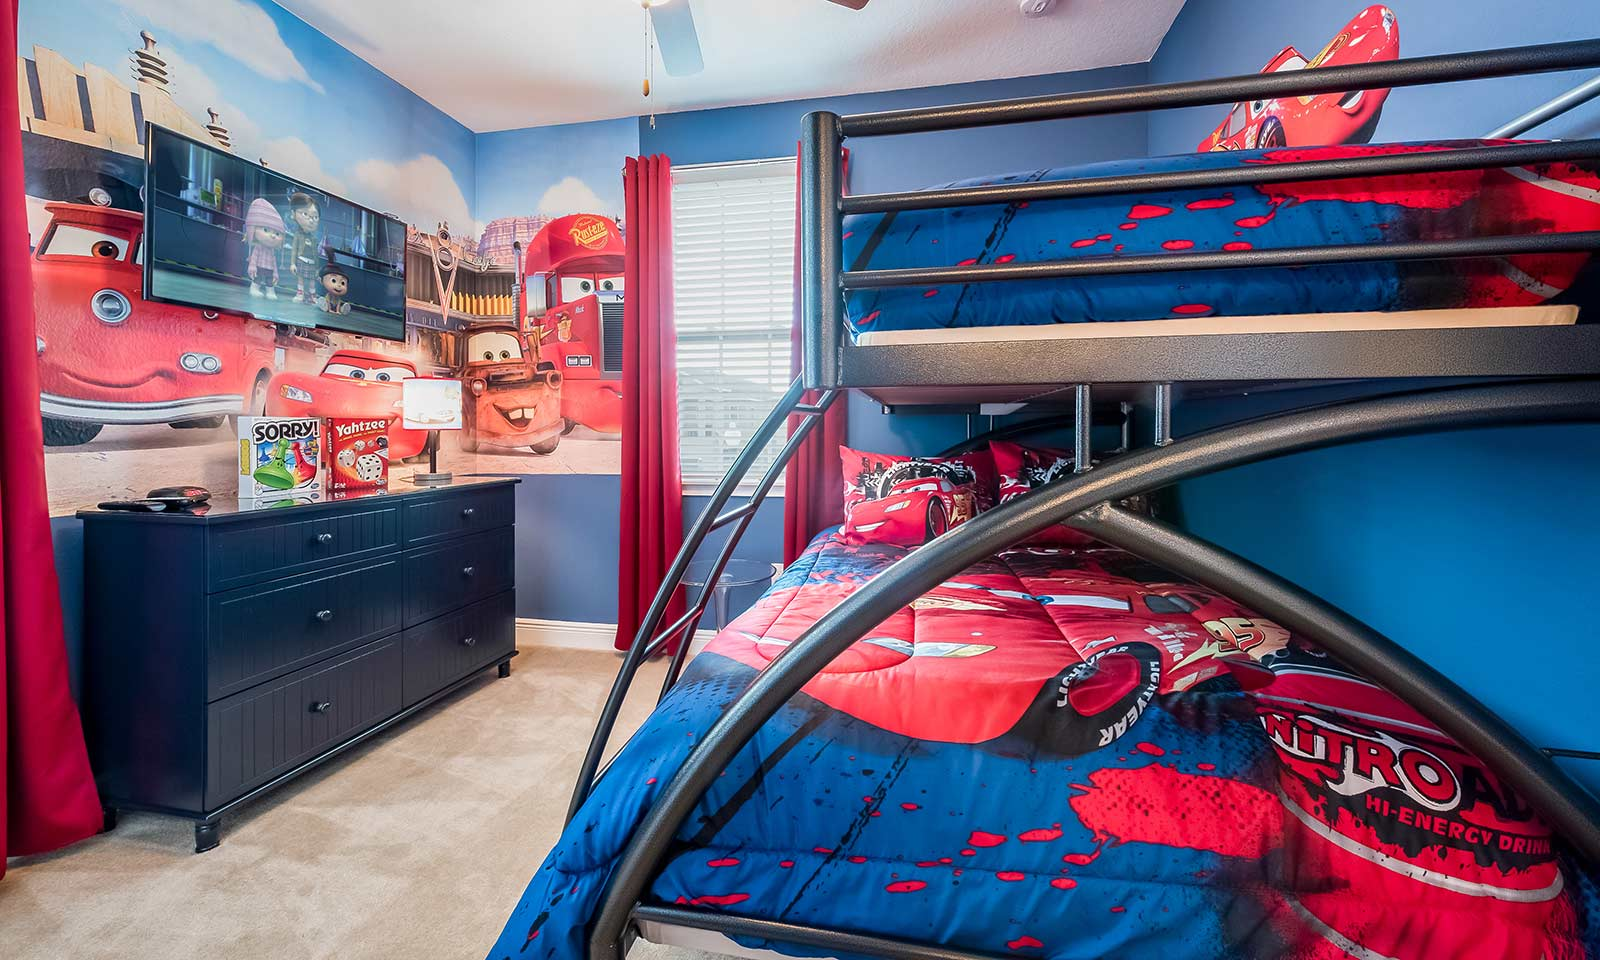 [amenities:themed-bedroom:2] Themed Bedroom